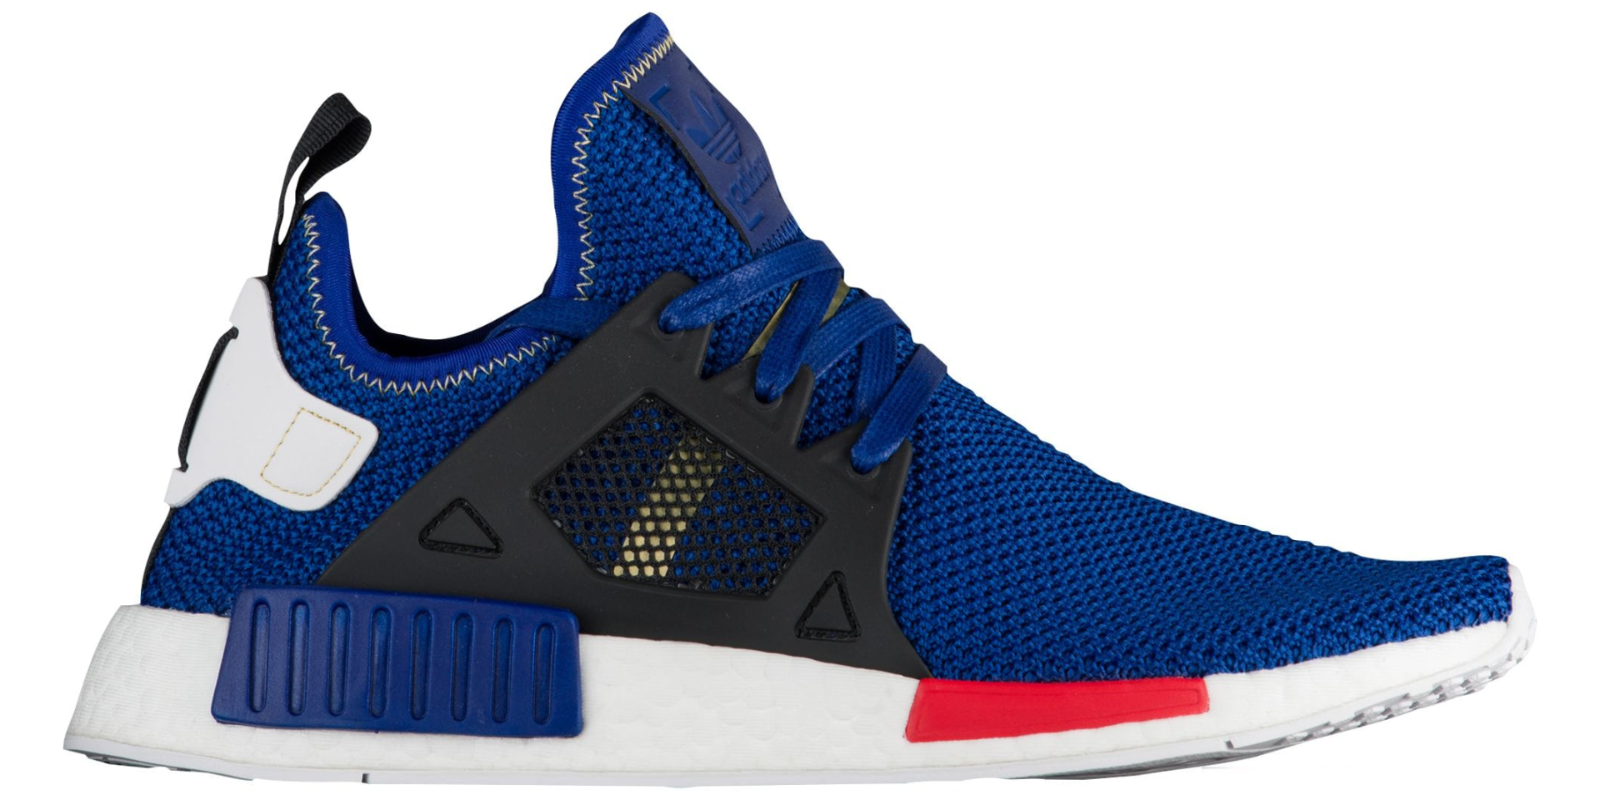 adidas nmd rot xr1 rätsel blau ac7185 rot nmd - schwarz originale mens 8d6b4c